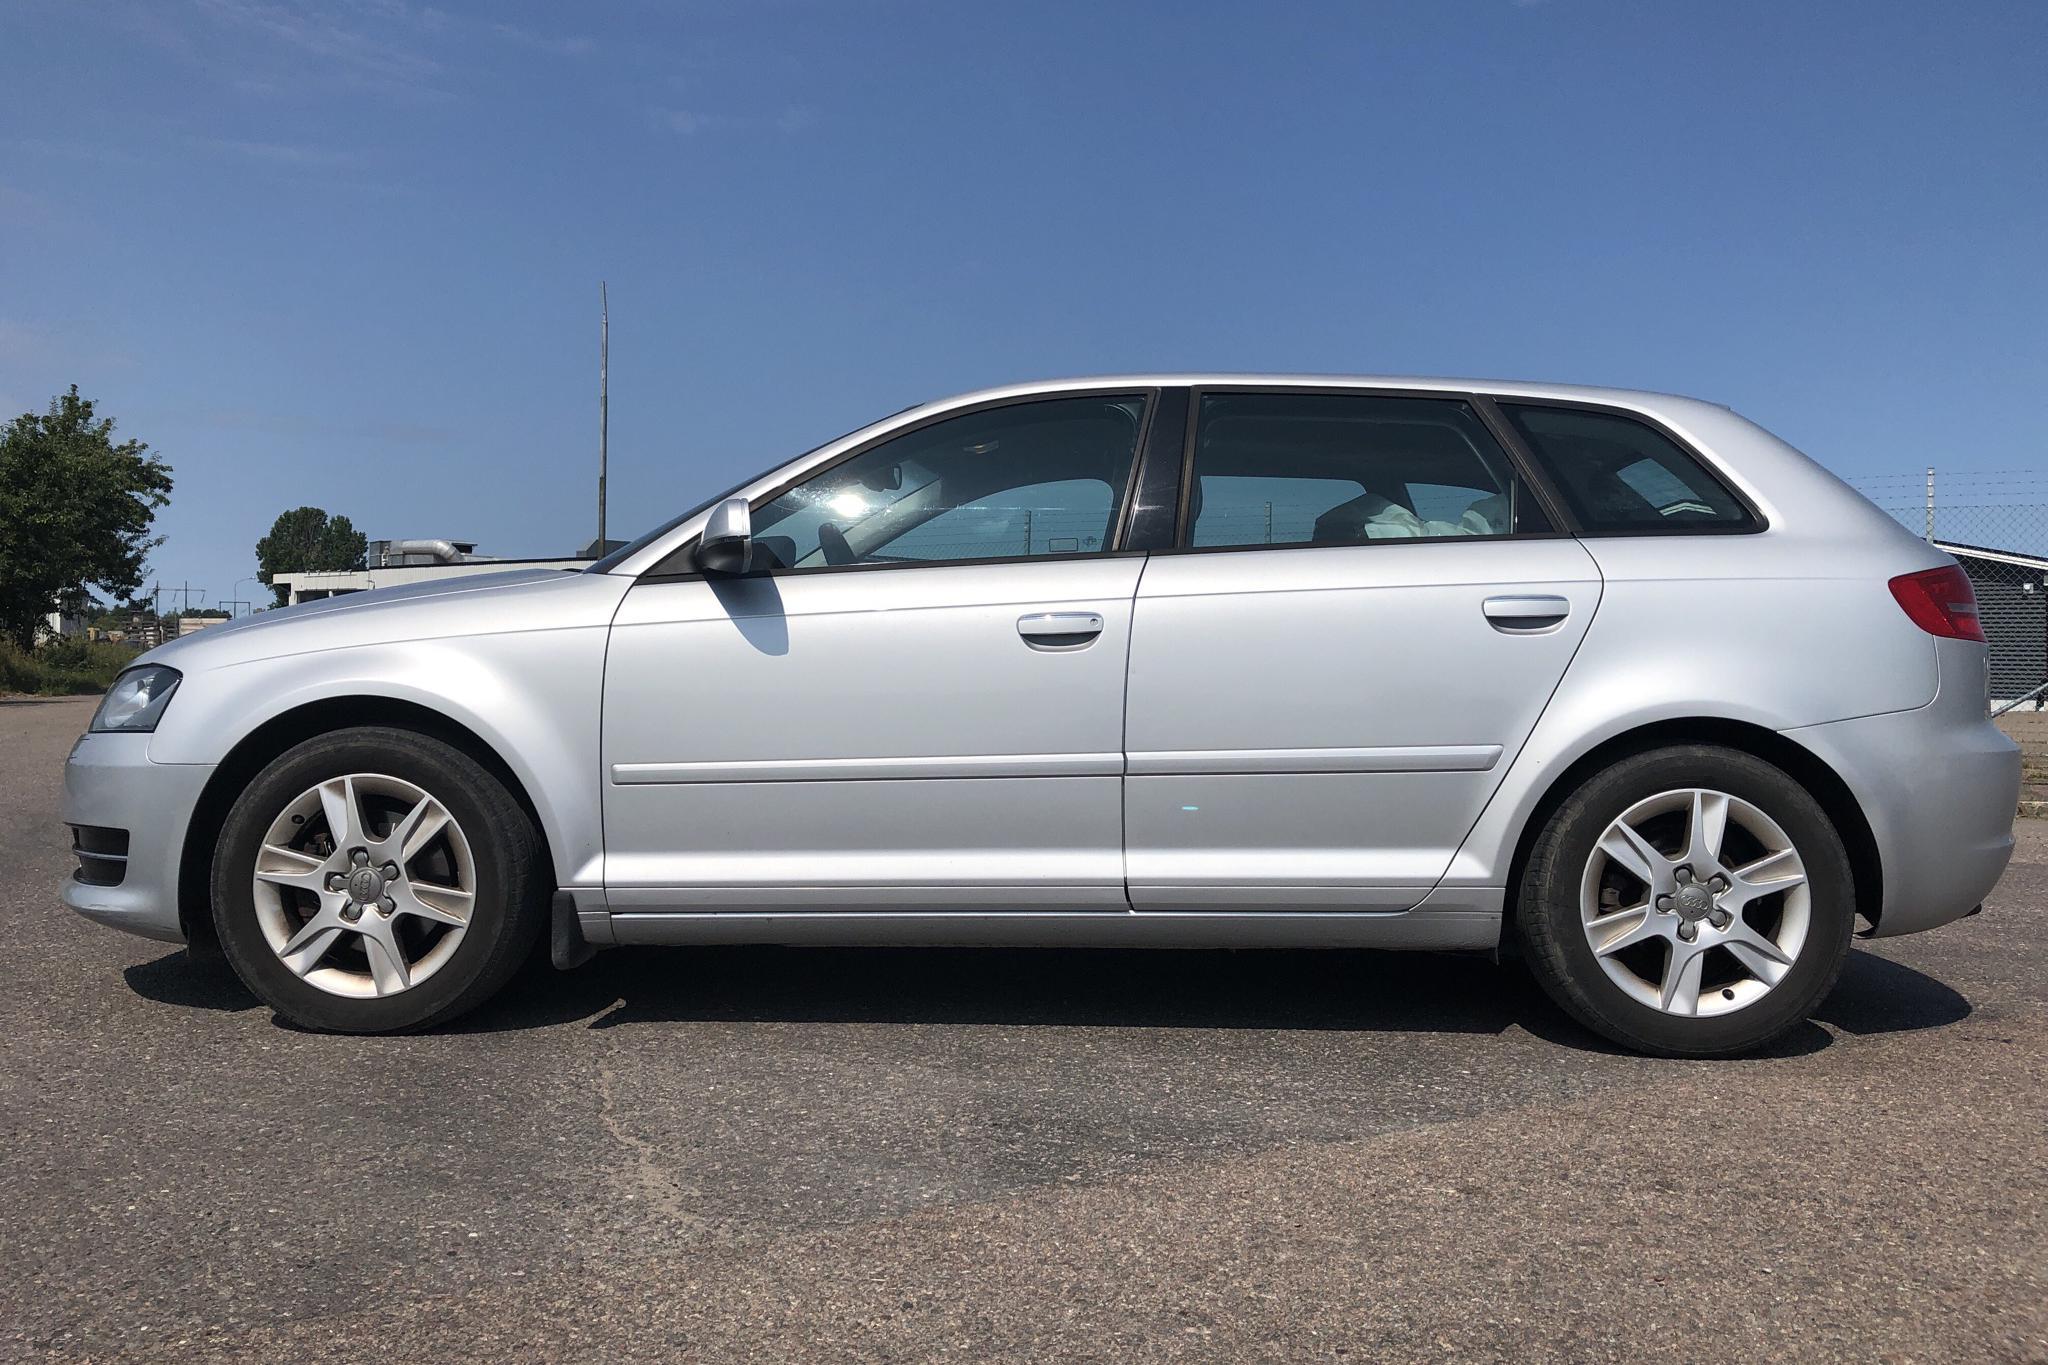 Audi A3 2.0 TDI Sportback (140hk) - 199 180 km - Manual - silver - 2013